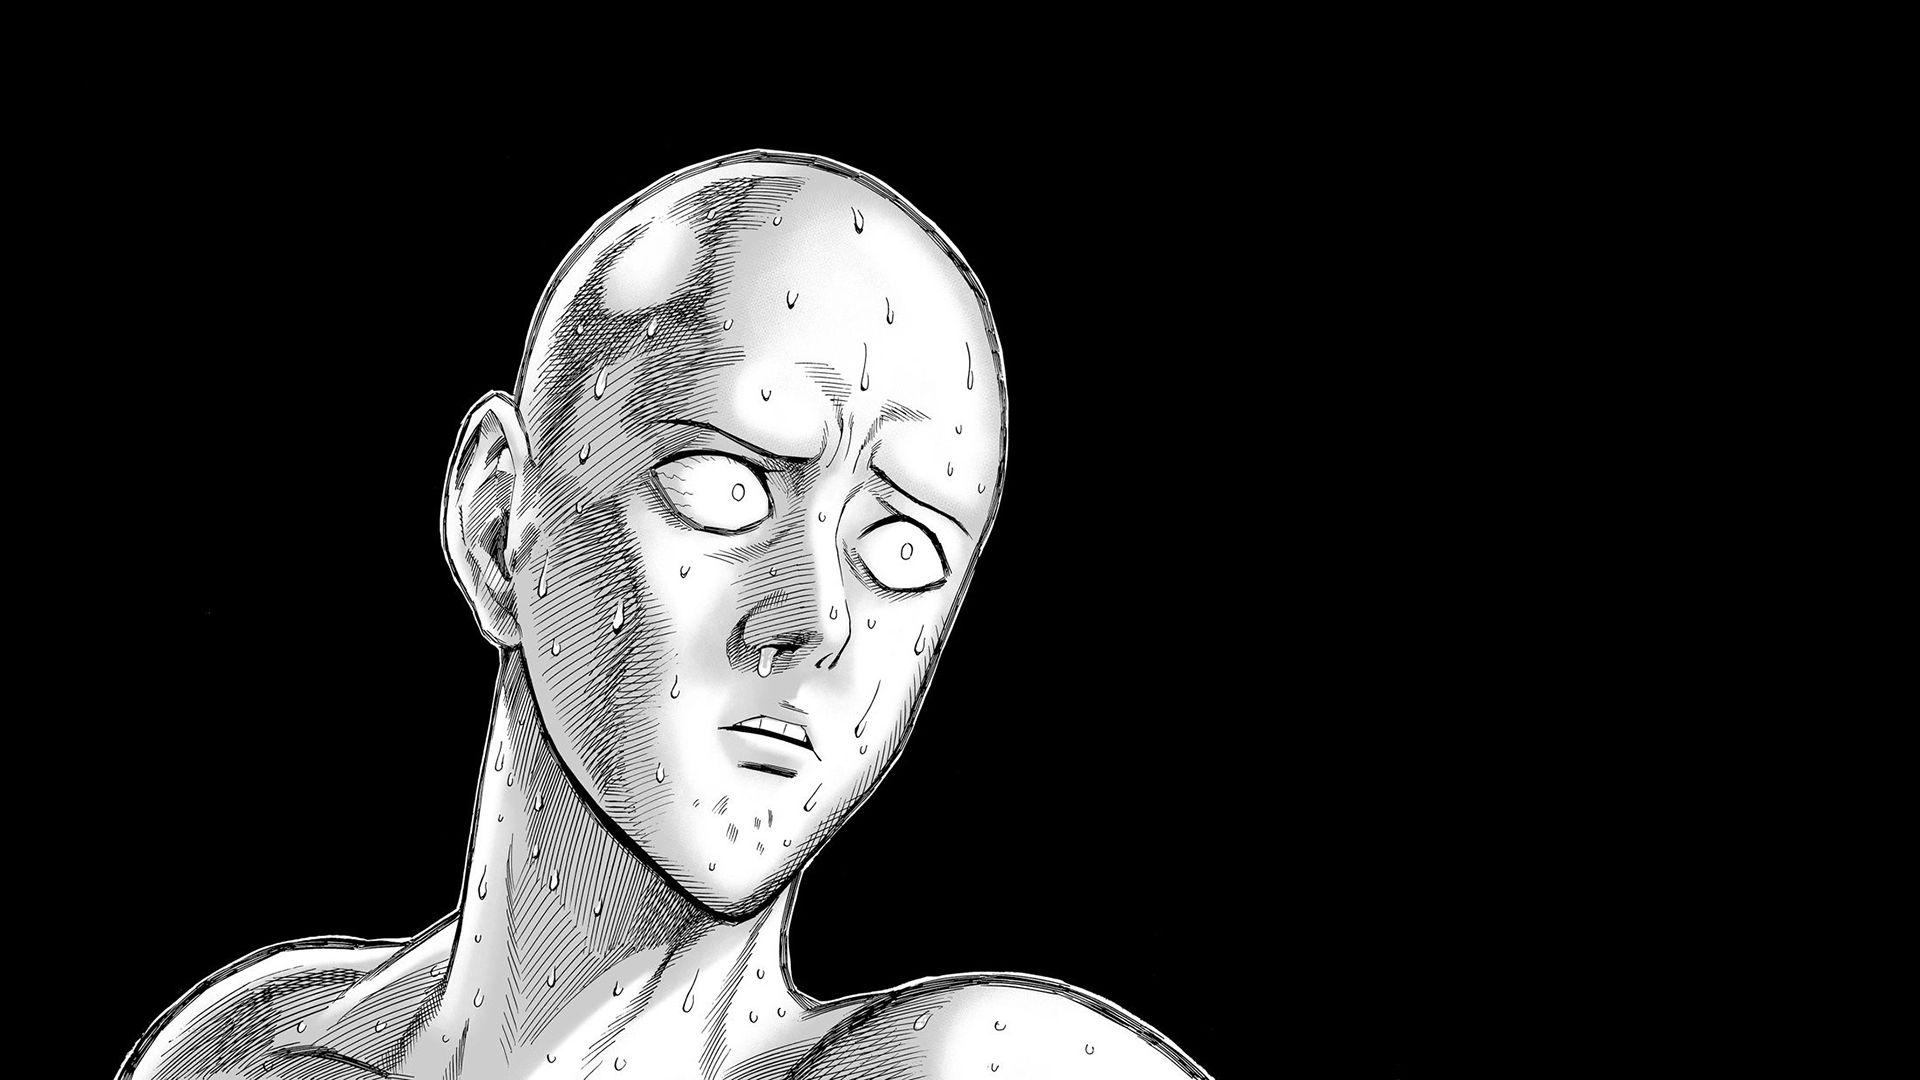 Saitama Stupid Face One Punch Man HD Wallpaper